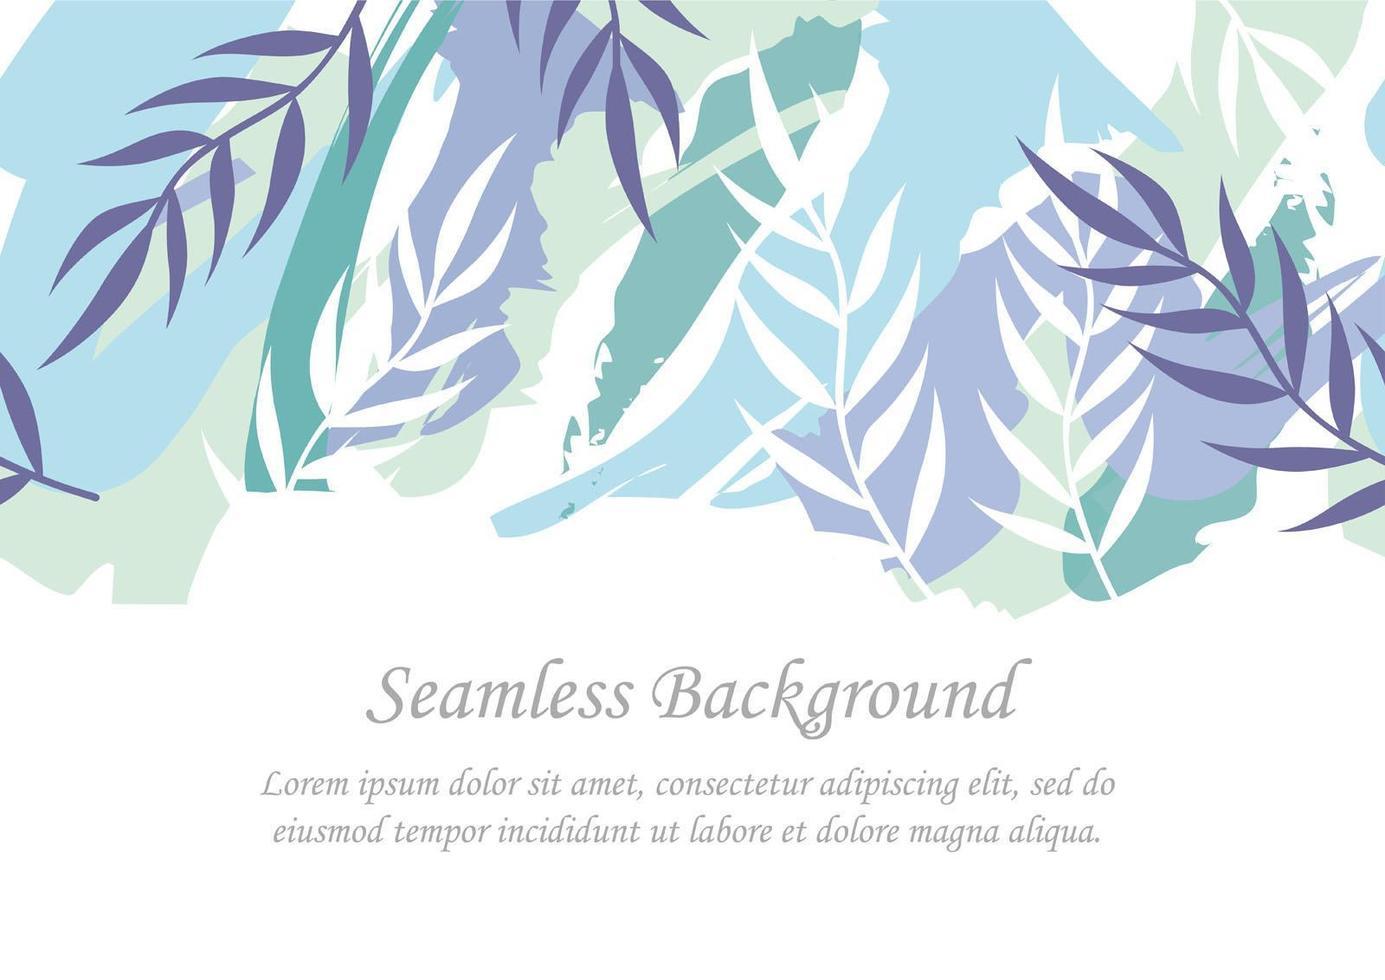 sömlös blå botanisk bakgrund med textutrymme vektor